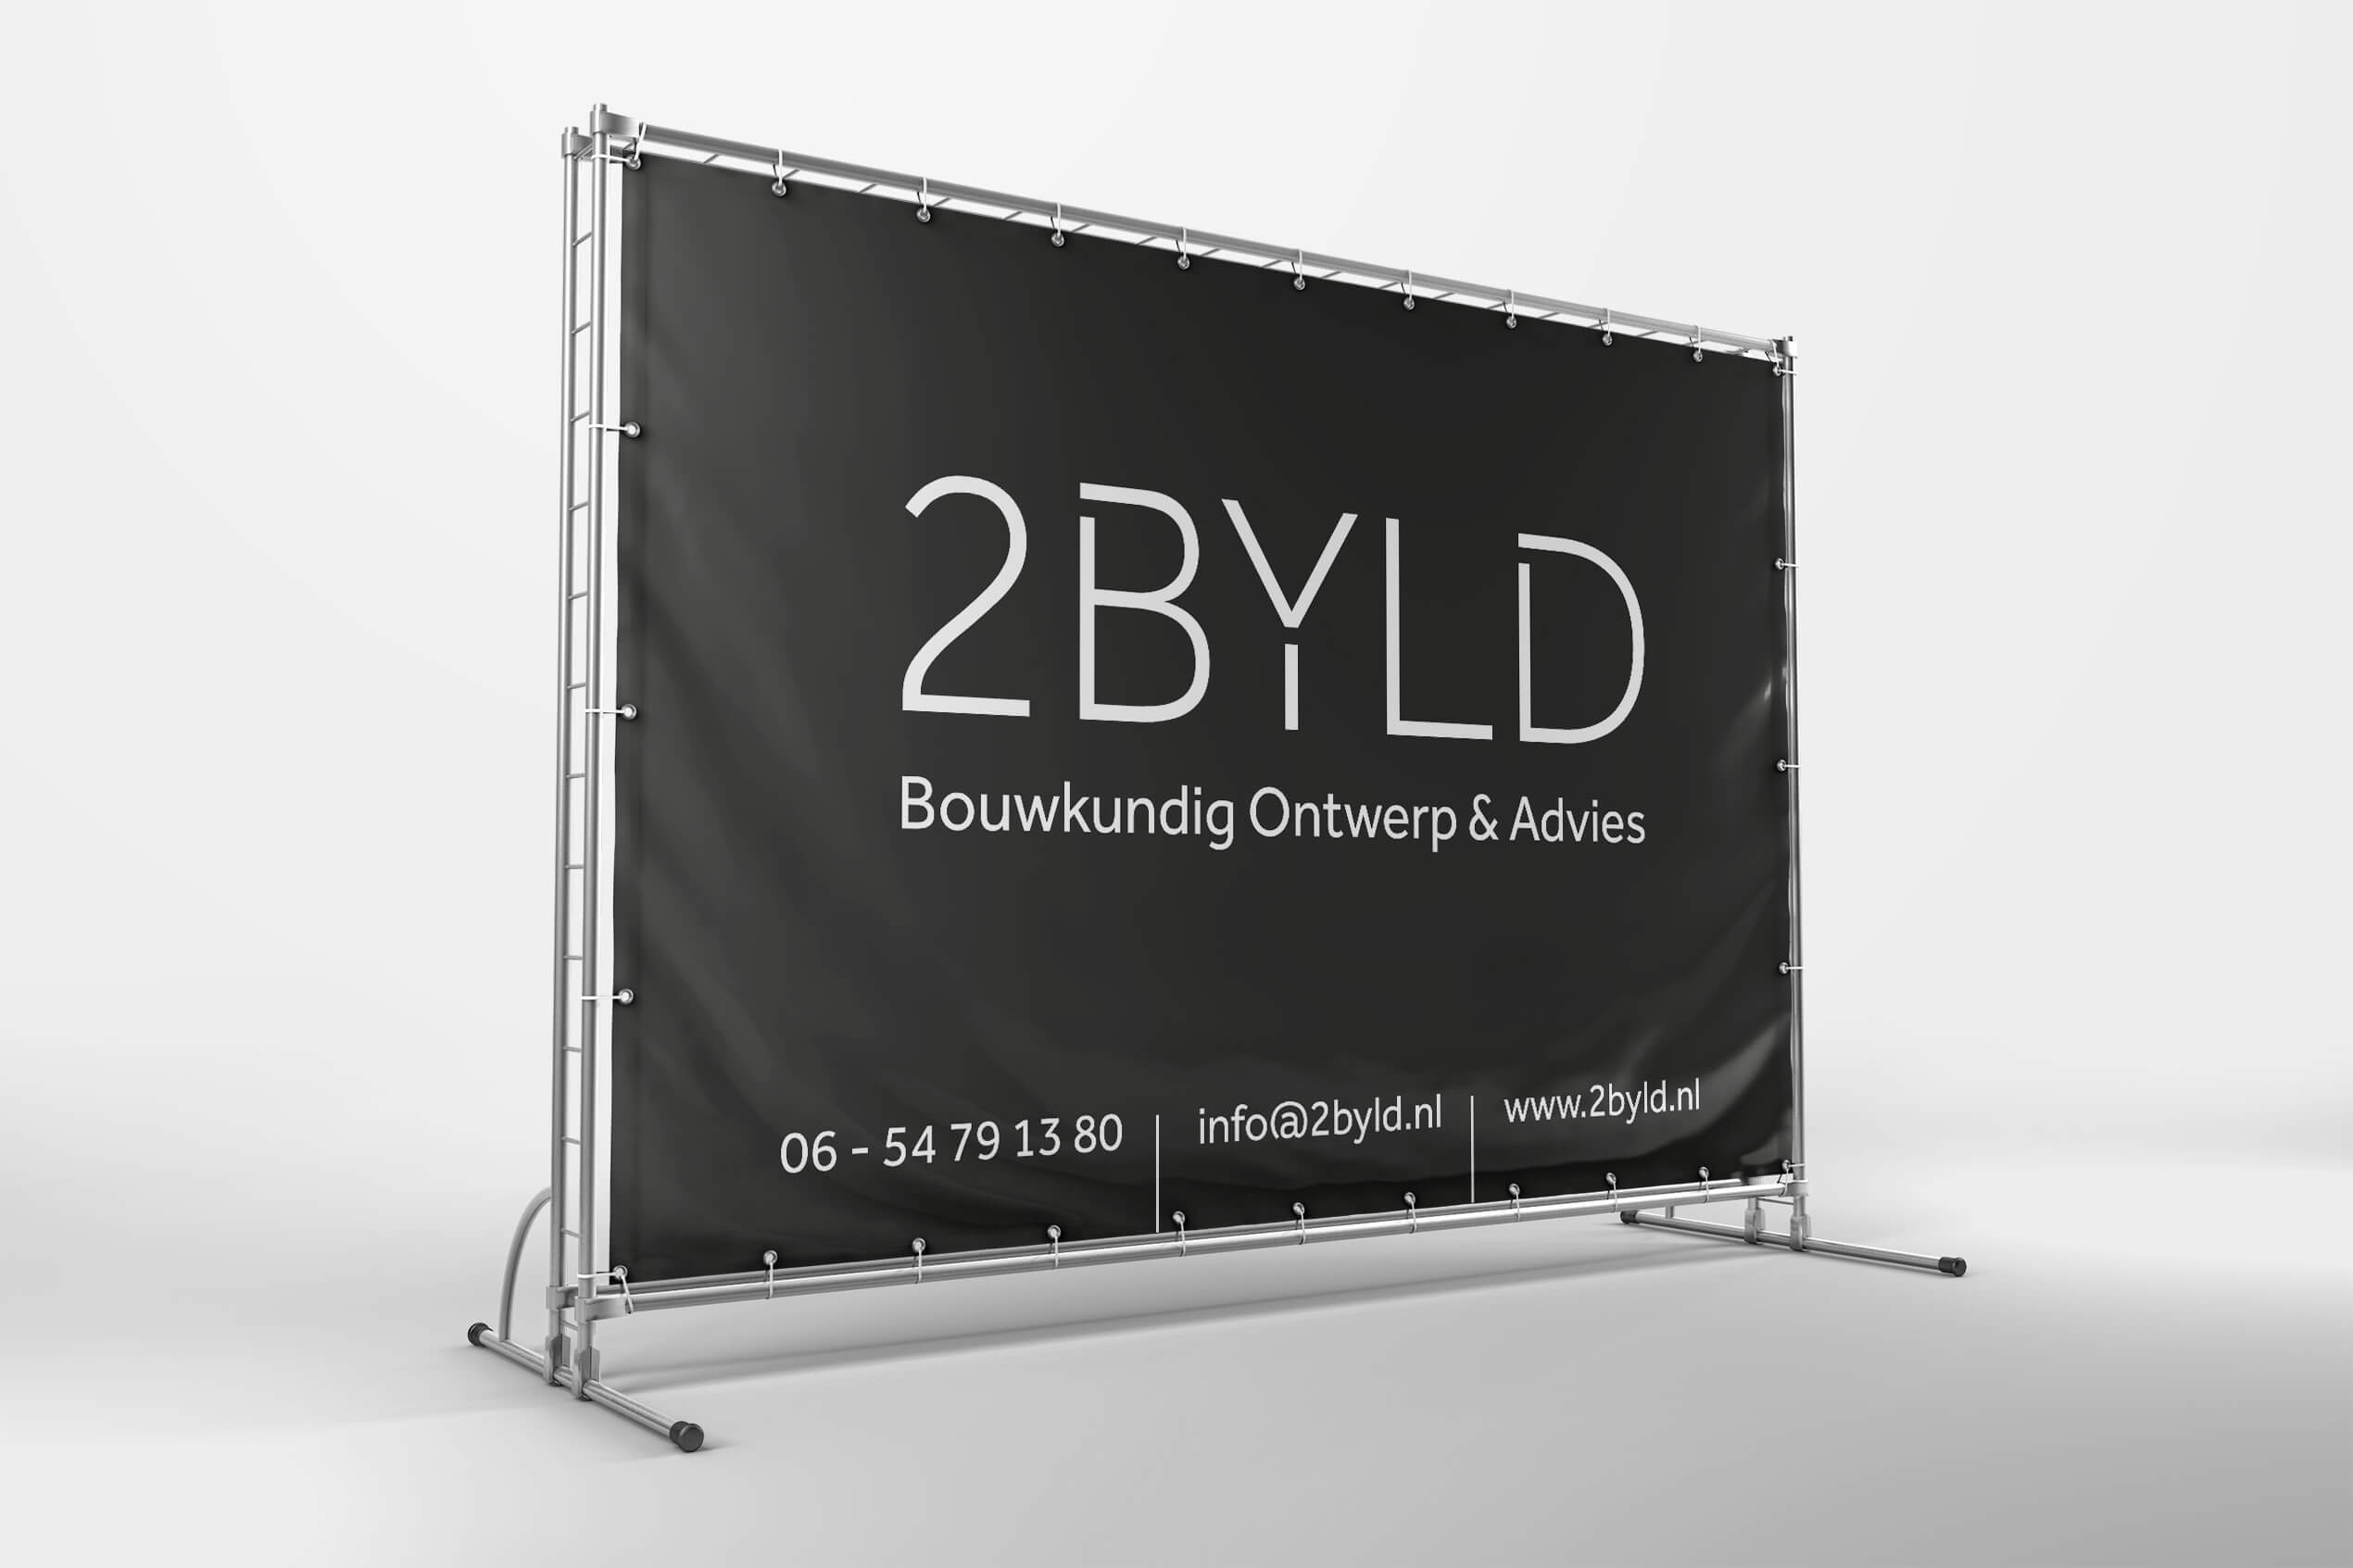 Bouwbord 2BYLD Bouwkundig ontwerp & advies